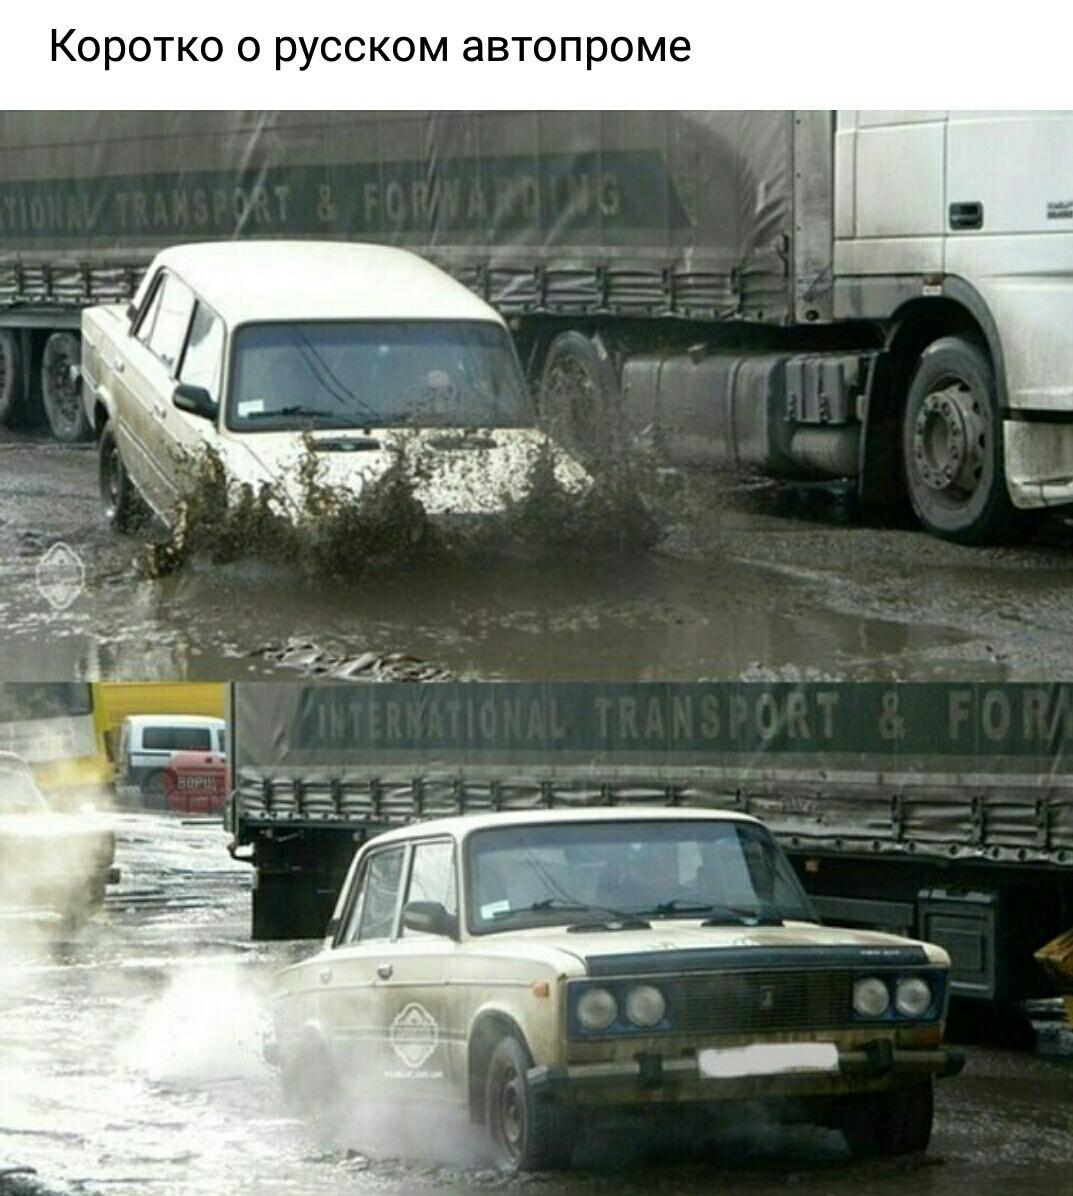 Орехи.тв - коротко о русском автопроме.